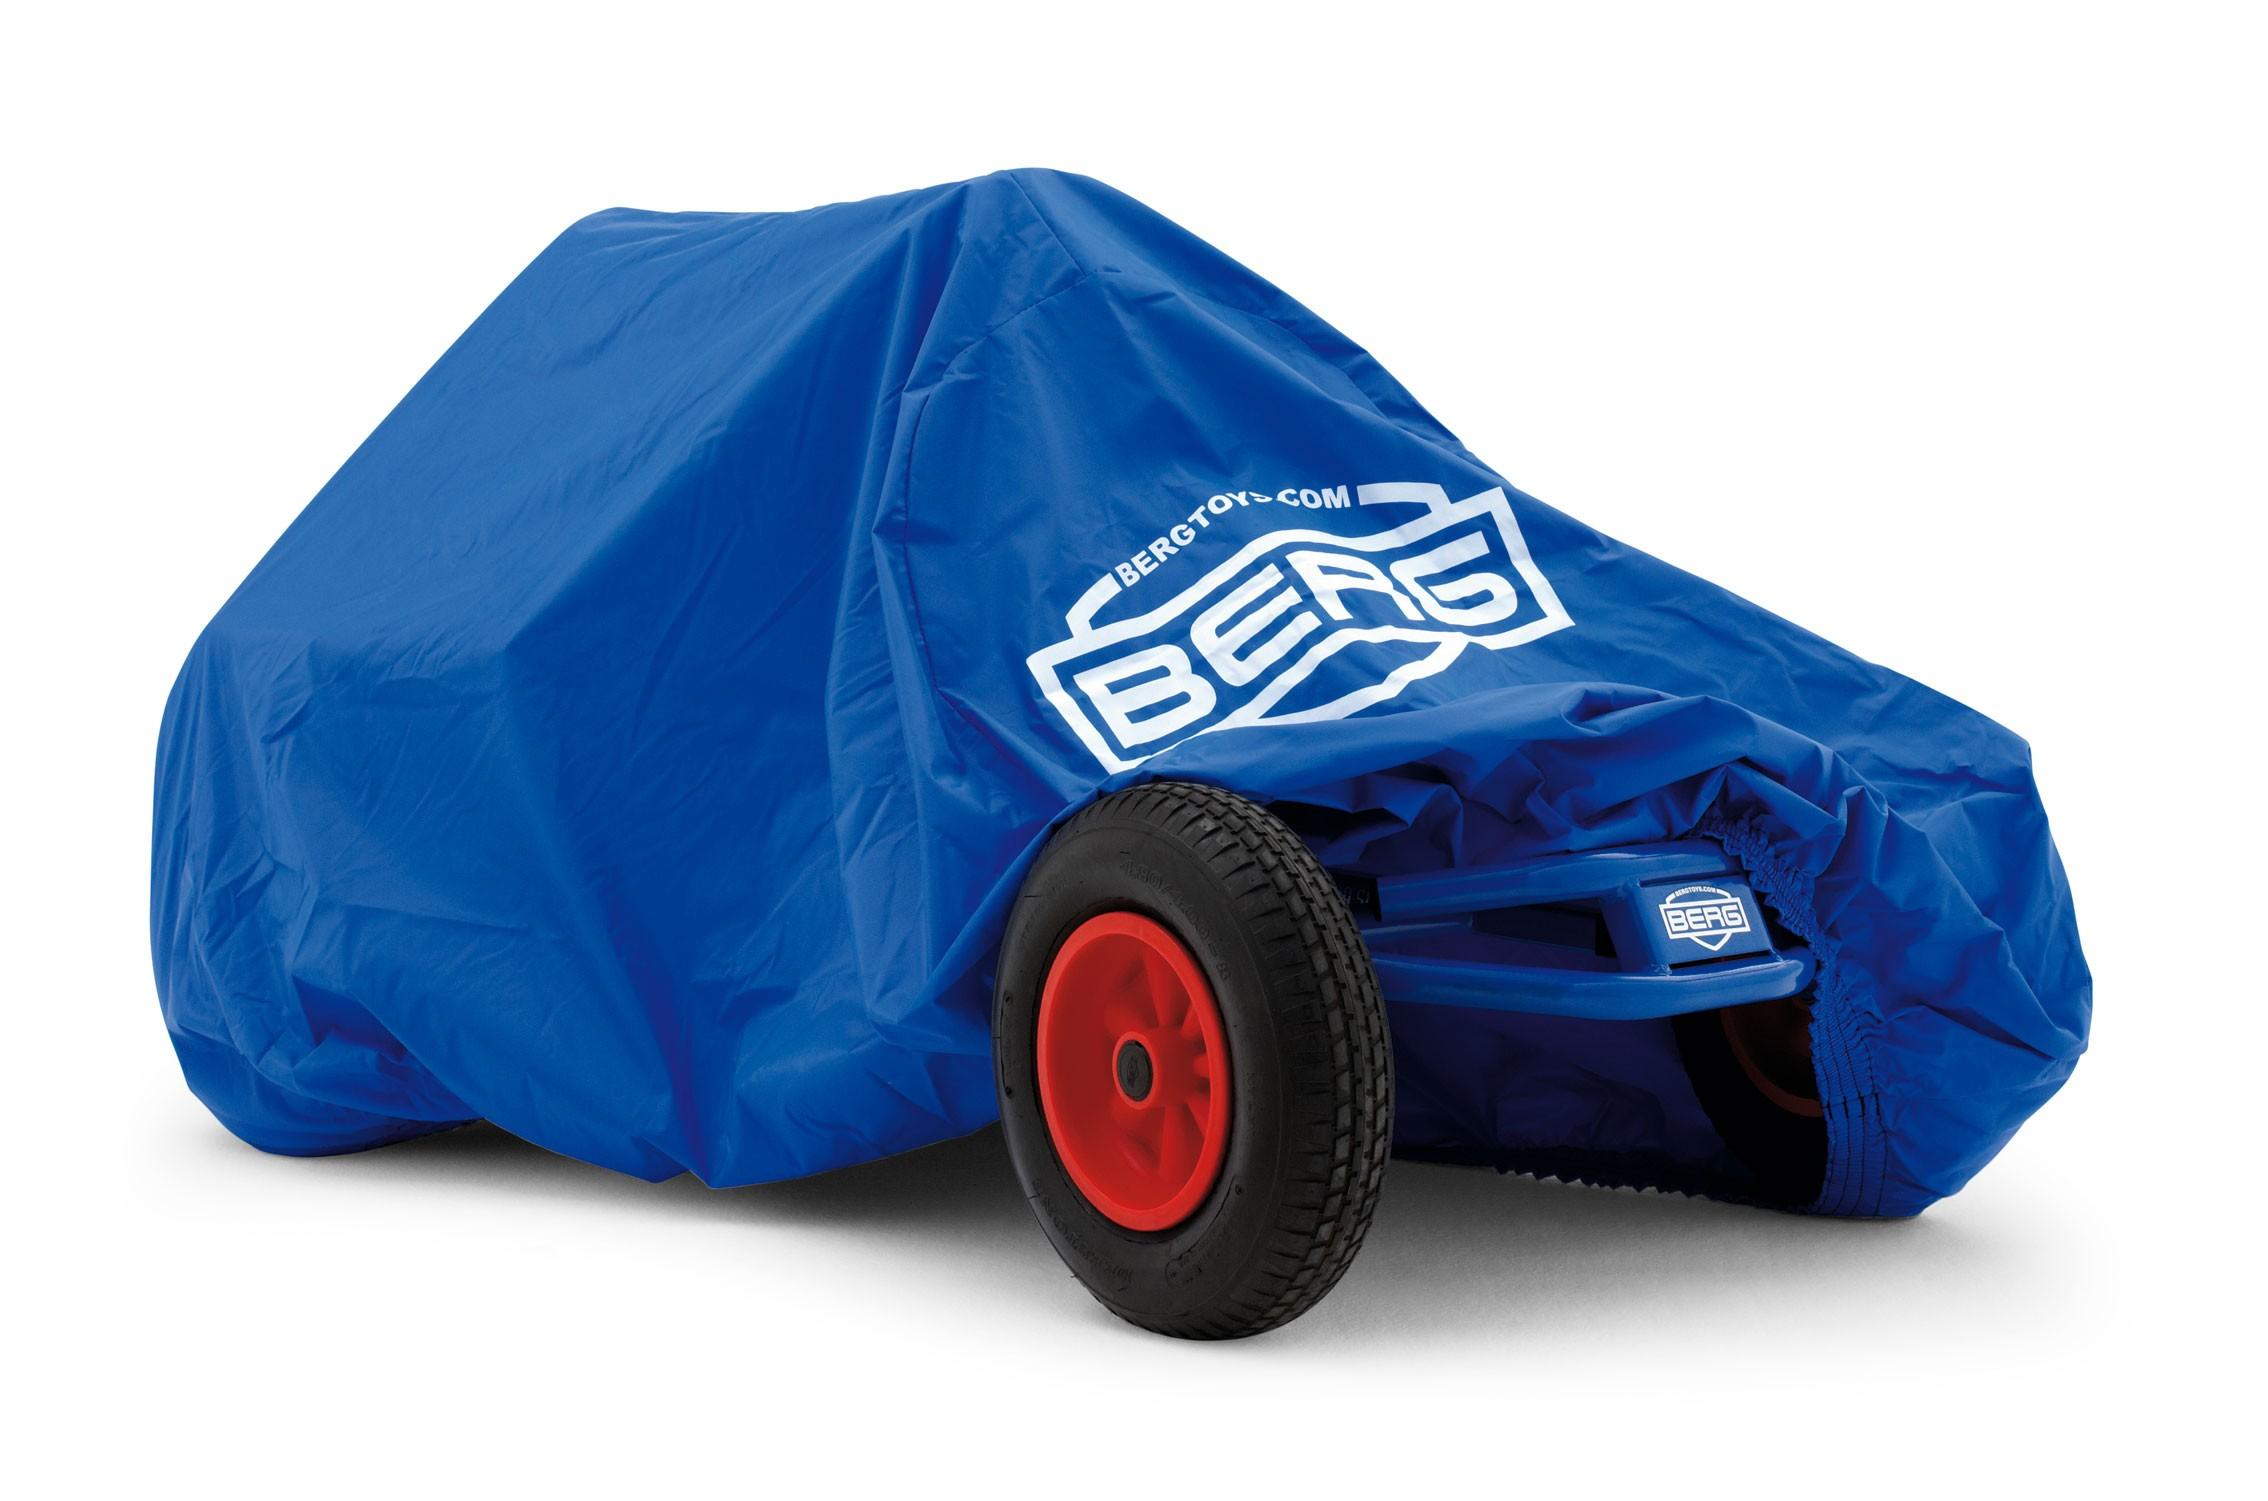 Abdeckhaube für Gokart / Pedal-Gokart BERG toys Bild 1